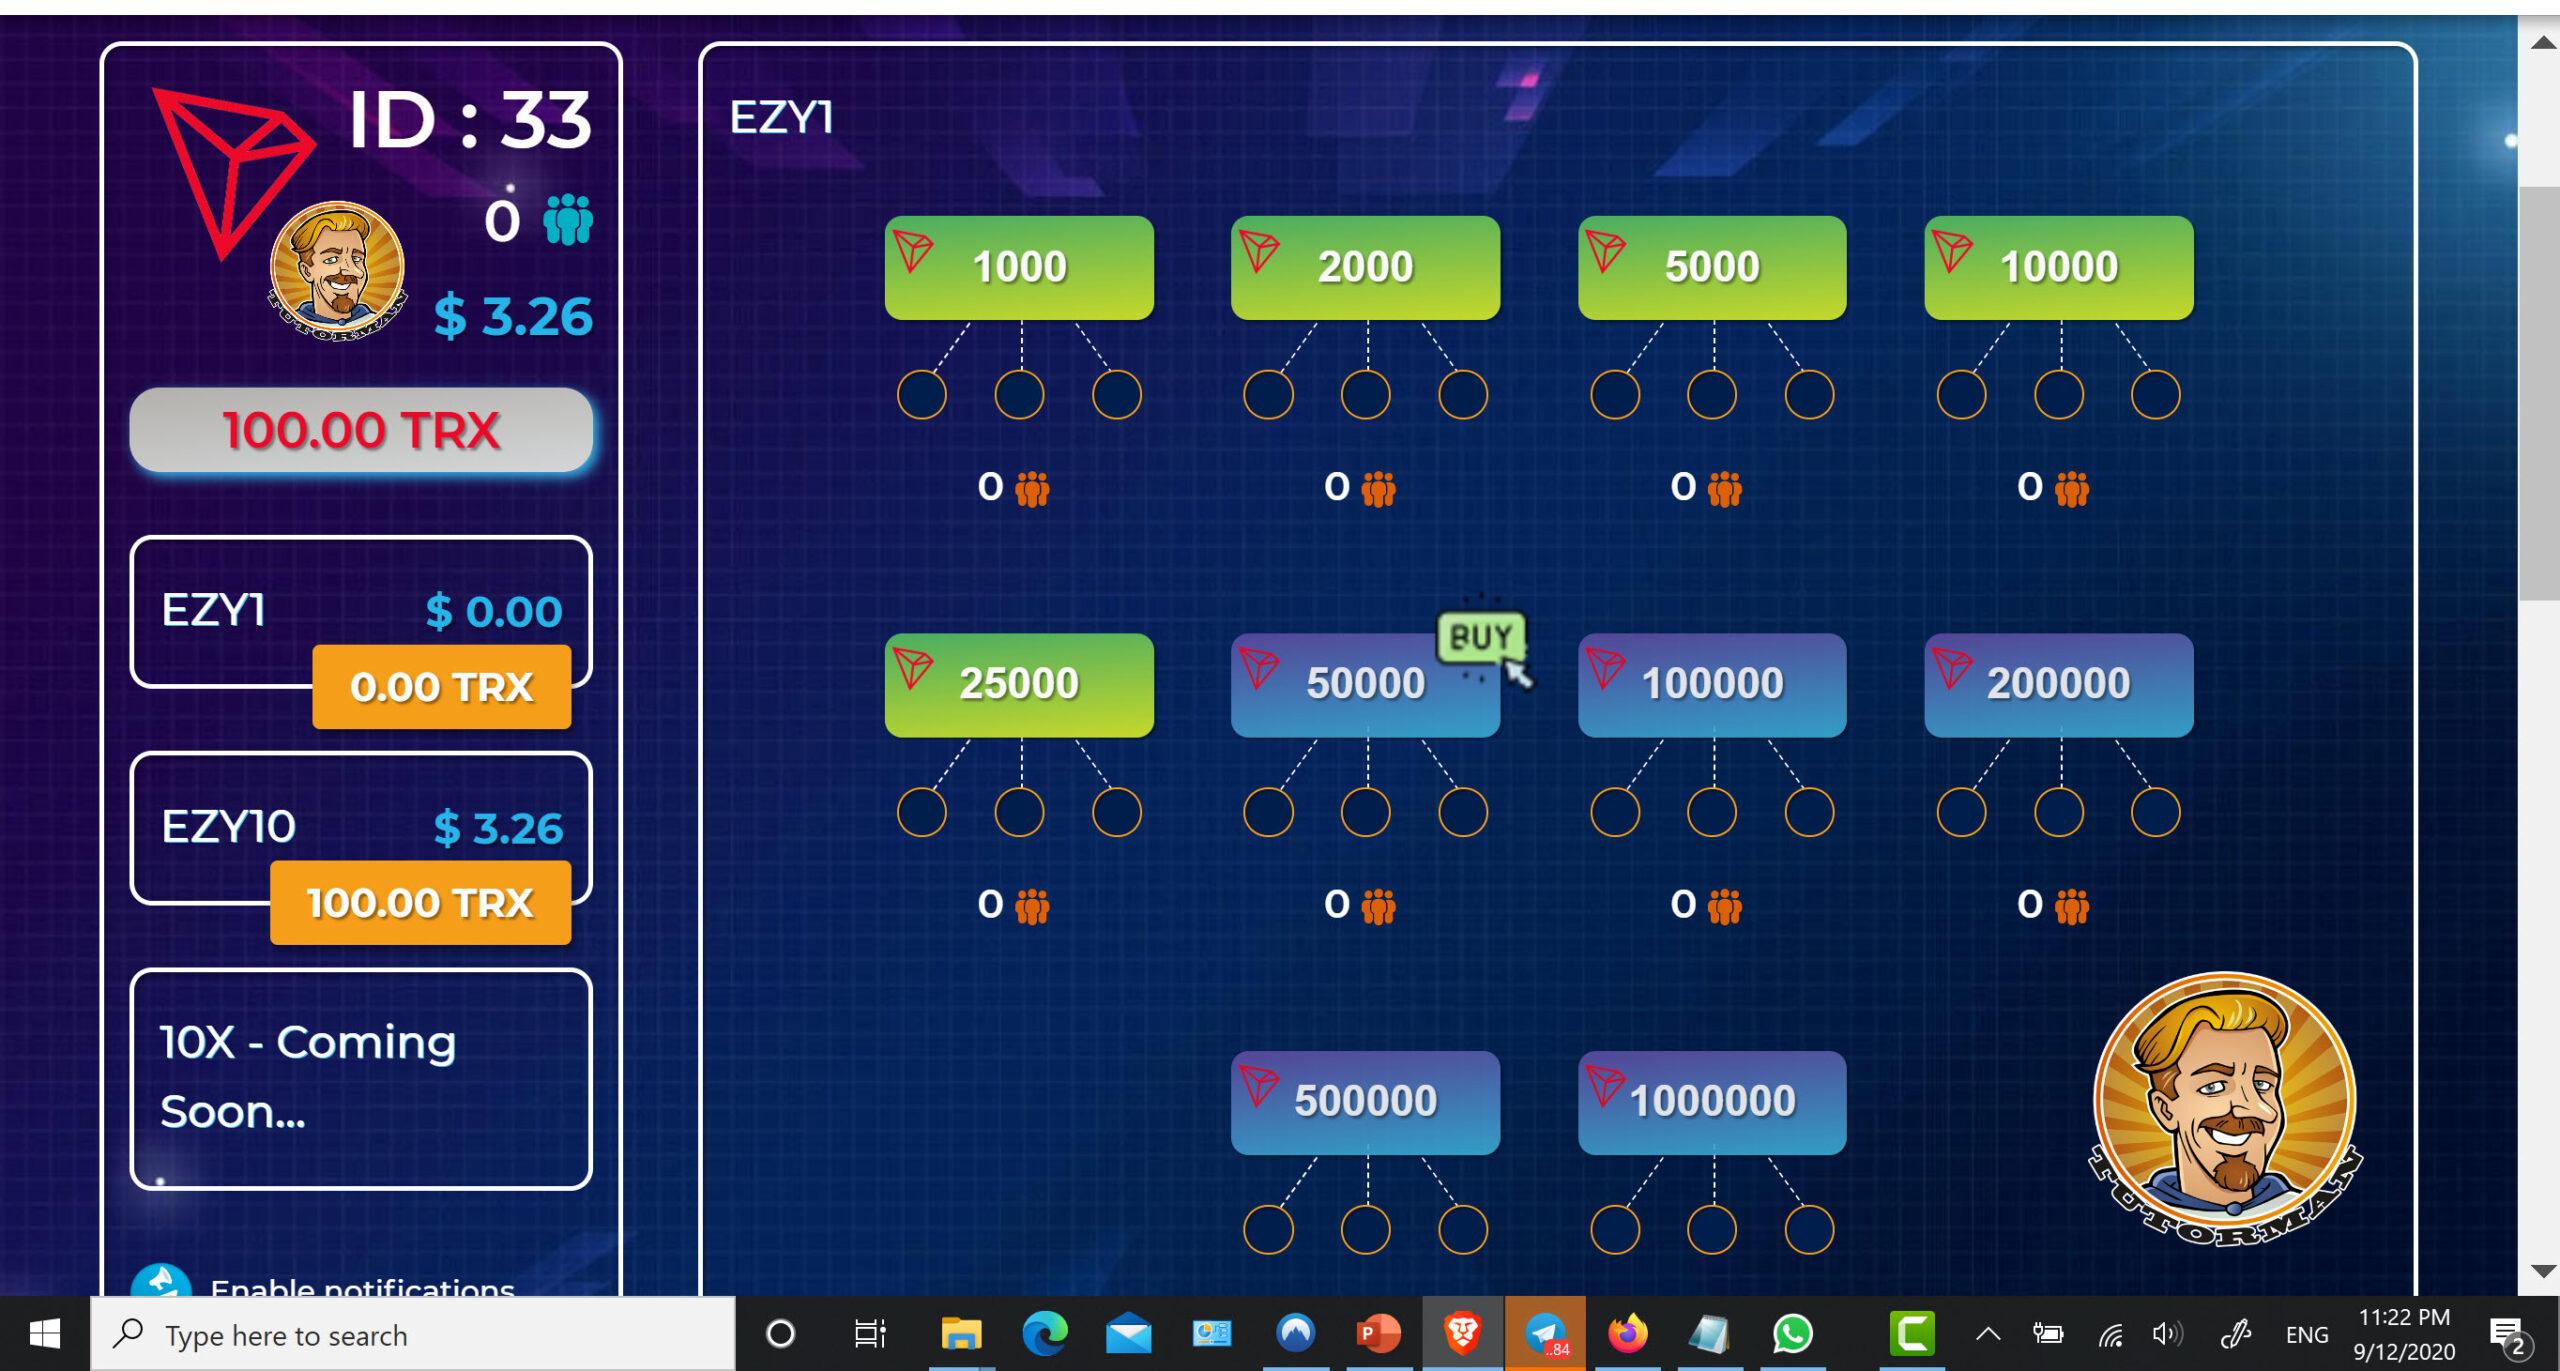 Ezytrx.com Fund First 5 Slots ID33 Screen shot 1 scaled